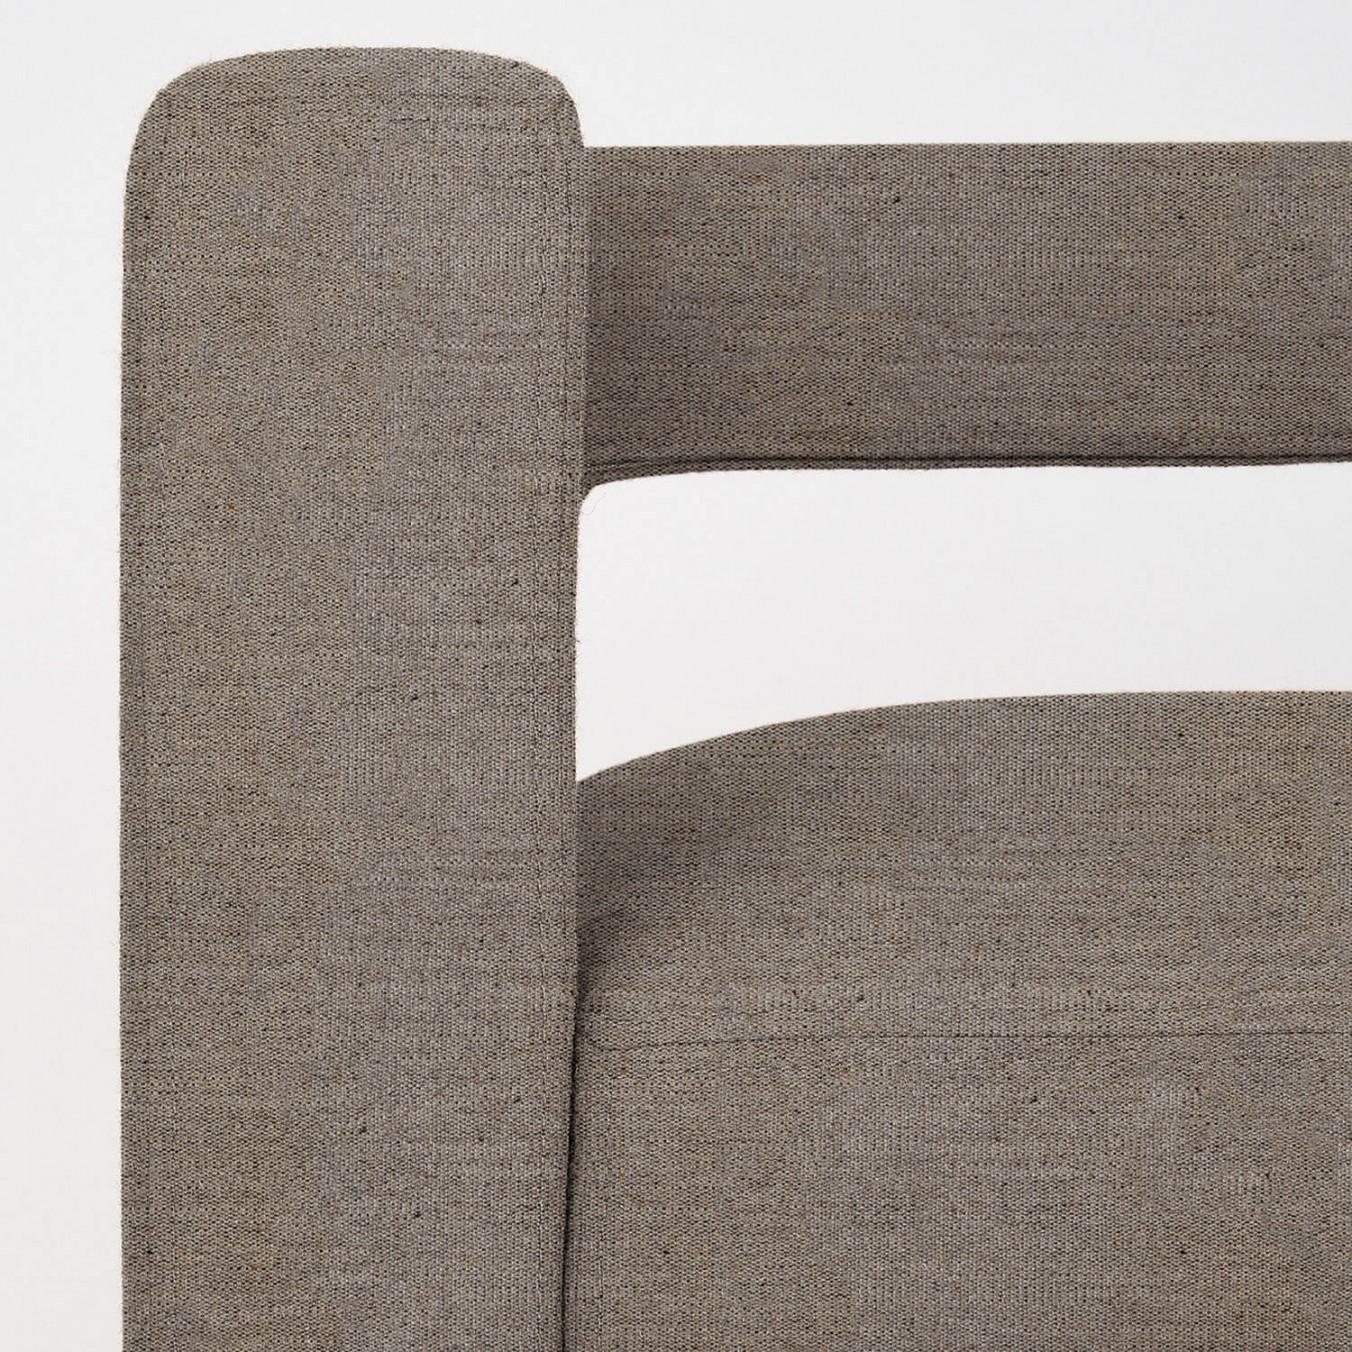 TOPTUN sofa